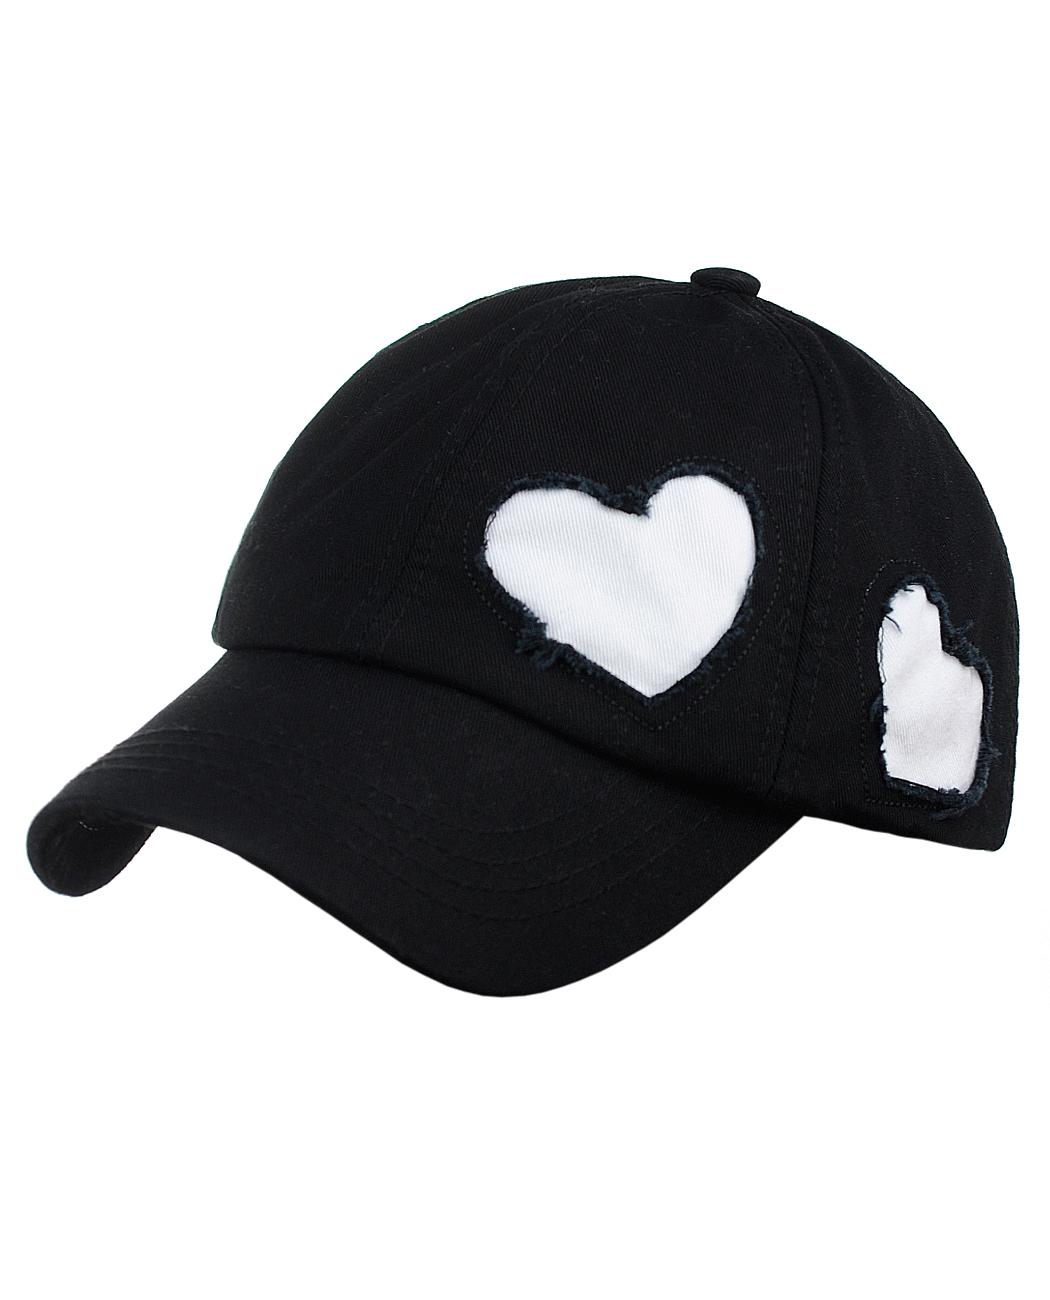 C.C Women's Heart Cut Design Cotton Unstructured Precurved Baseball Cap Hat, Black